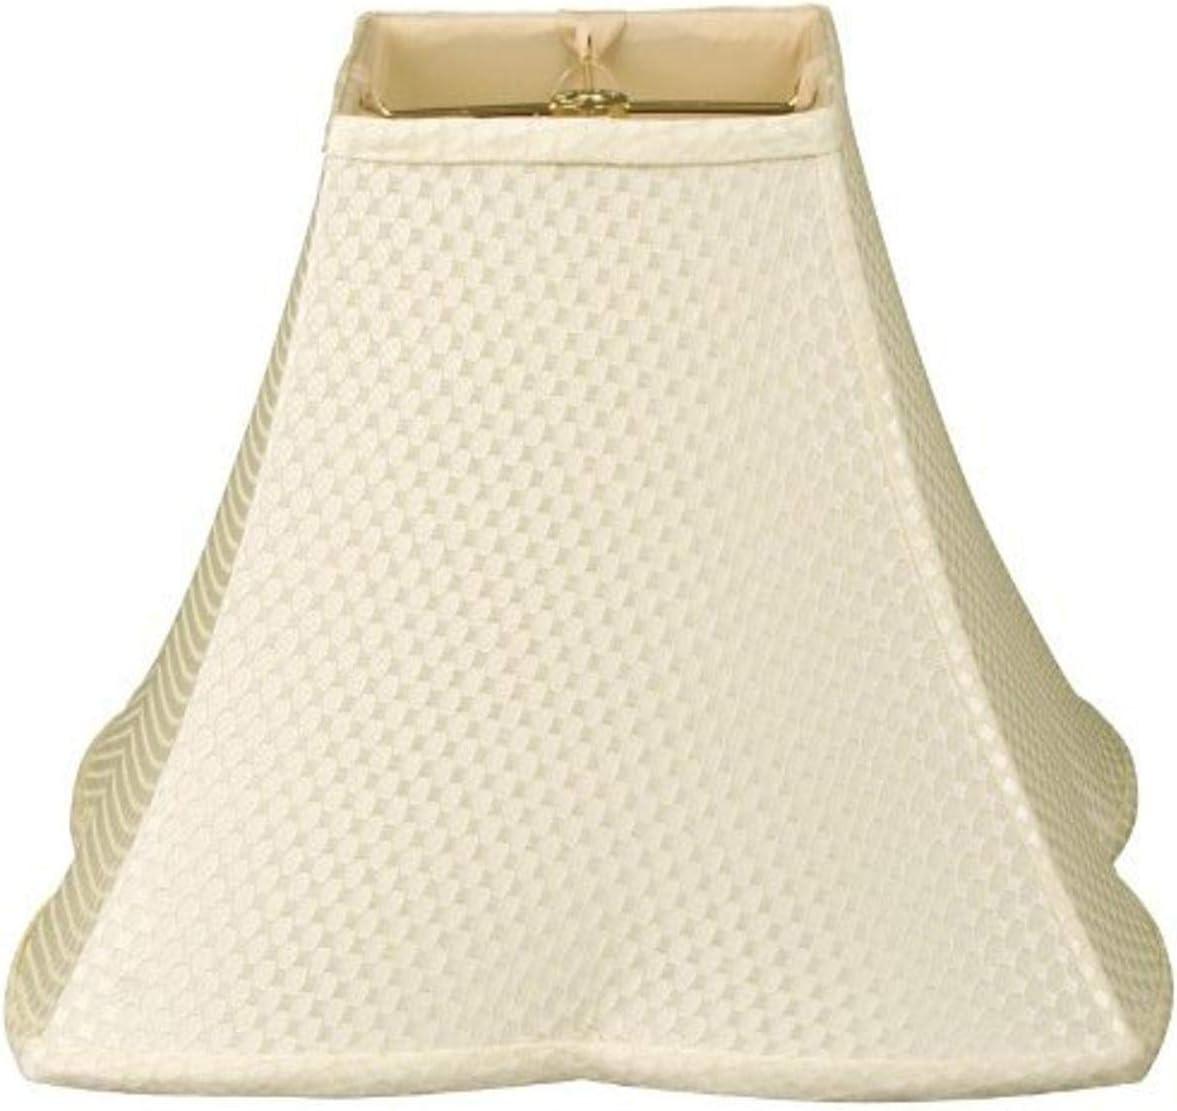 Royal Designs Square Empire Patterned Cream Designer Lamp Oklahoma City Mall Shade Popular overseas